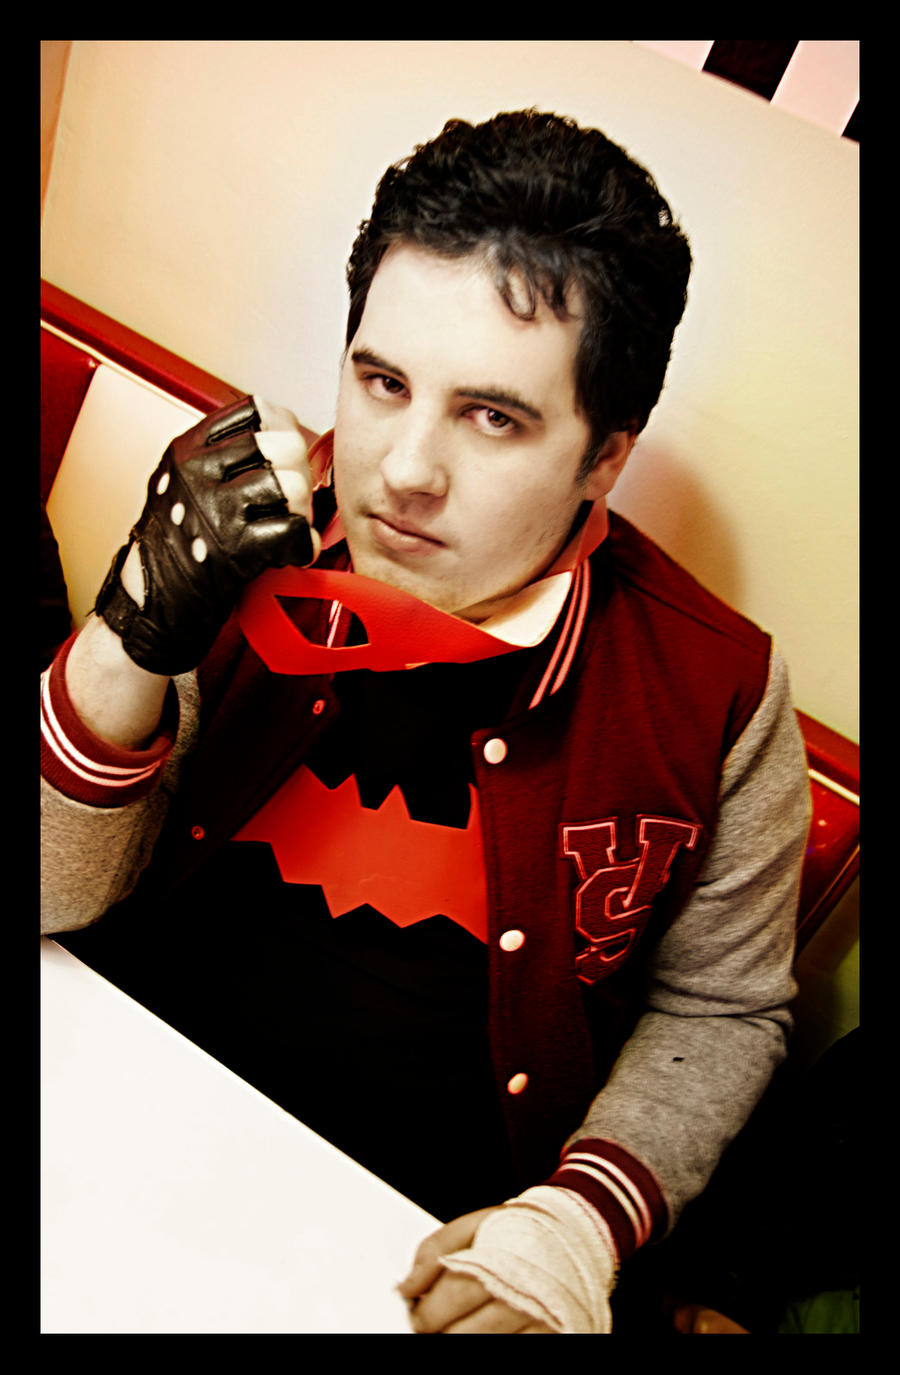 Red Hood Batman Rockabilly universe by JonathanDuran